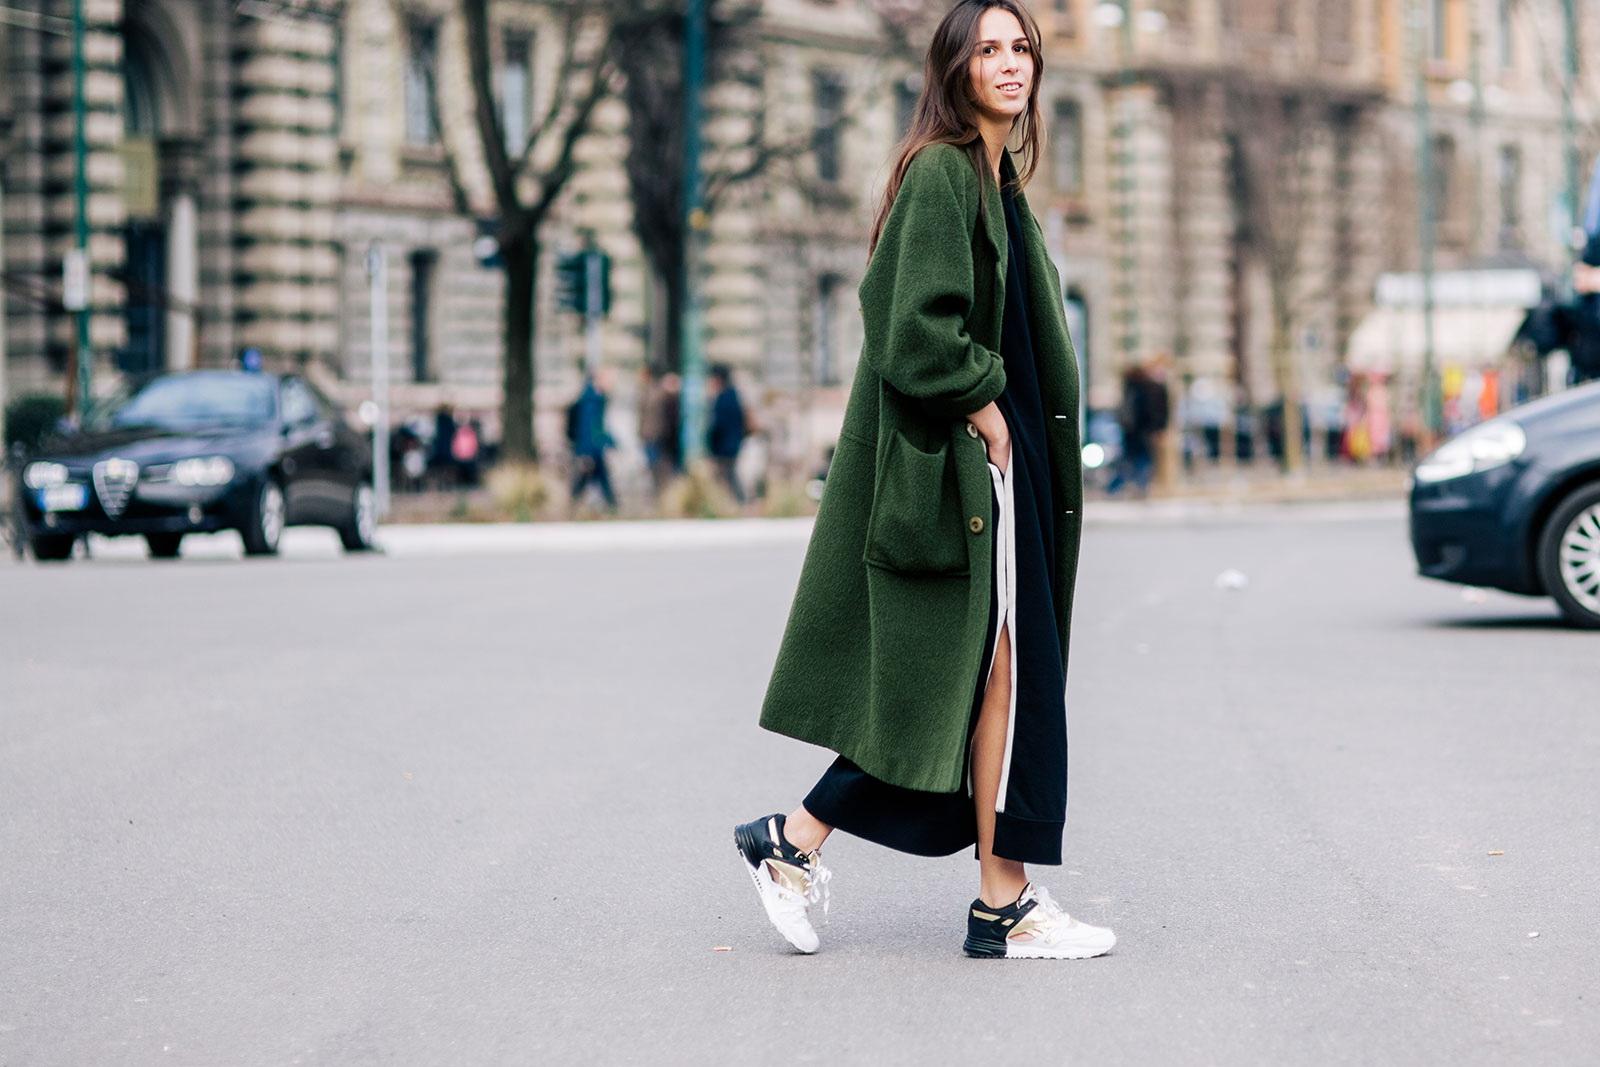 15 looks originales para esta temporada oto o invierno peluquer a mdv Fashion trends street style 2016